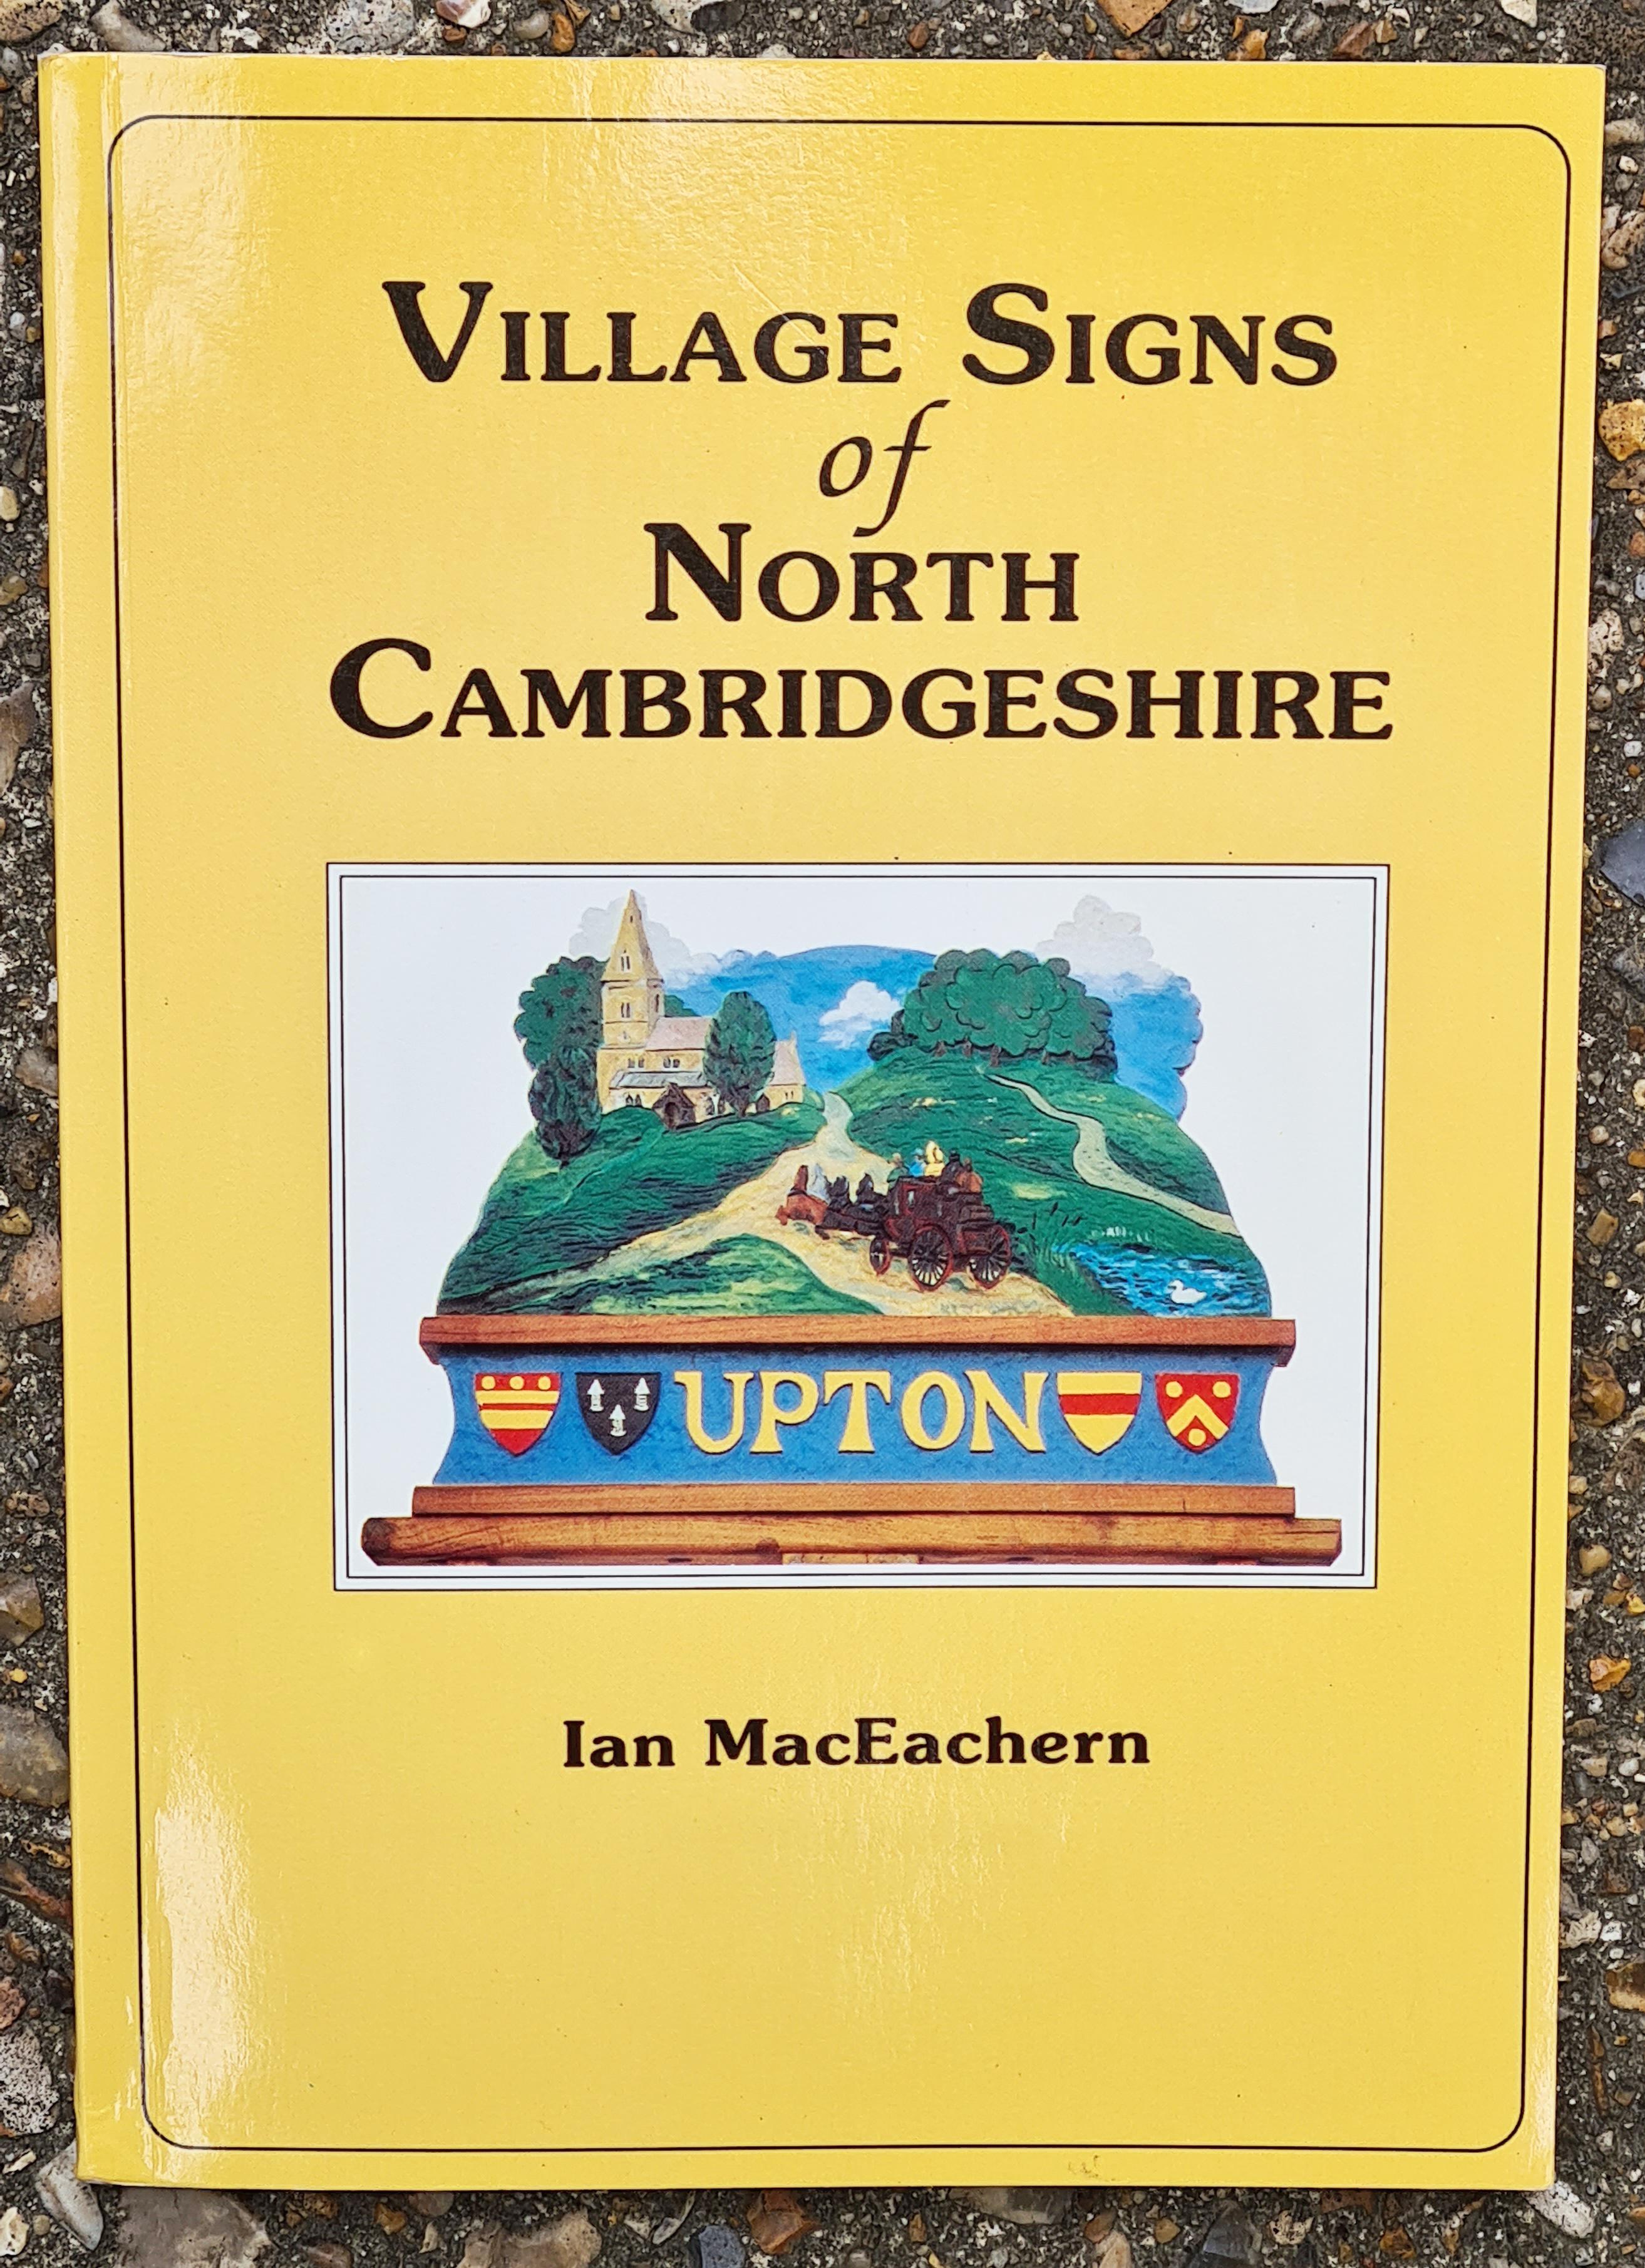 Village Signs of North Cambridgeshire